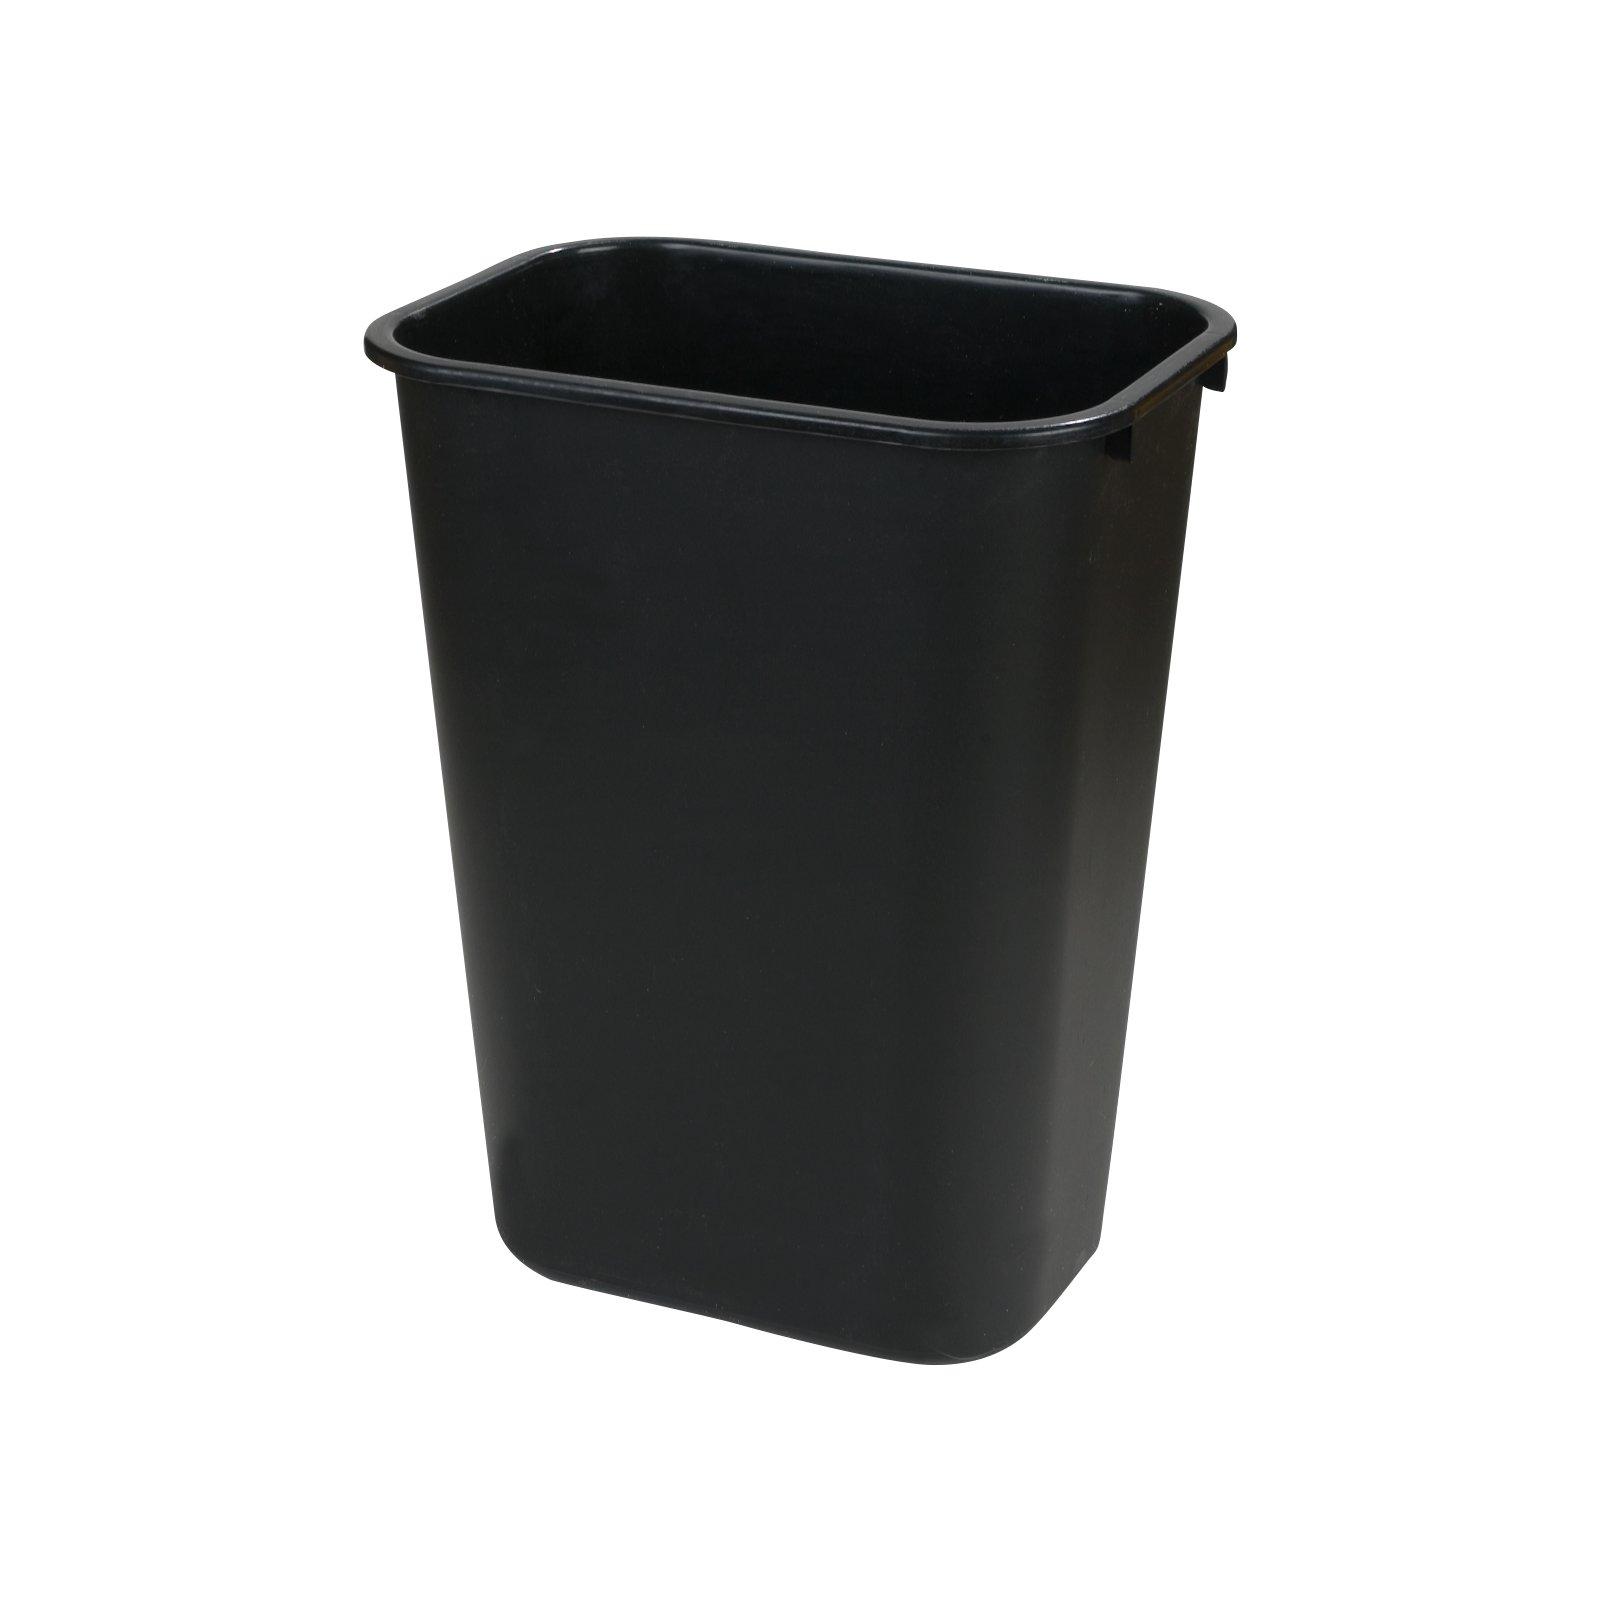 3700-51 Carlisle Waste Basket 10gal, Plastic